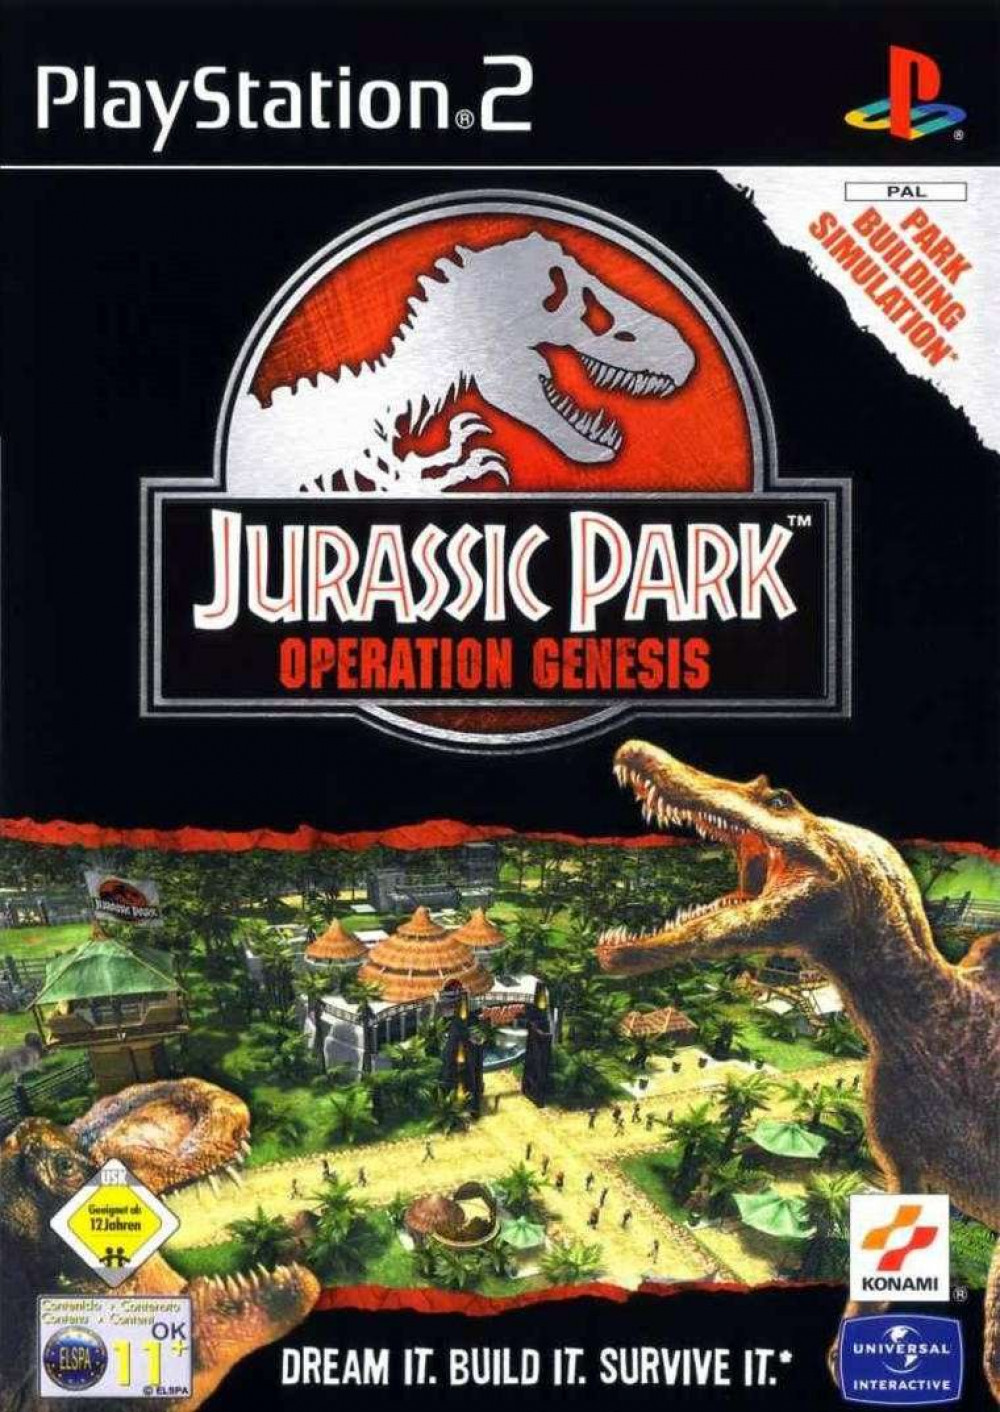 PS2 JURASSIC PARK Operation Genesis